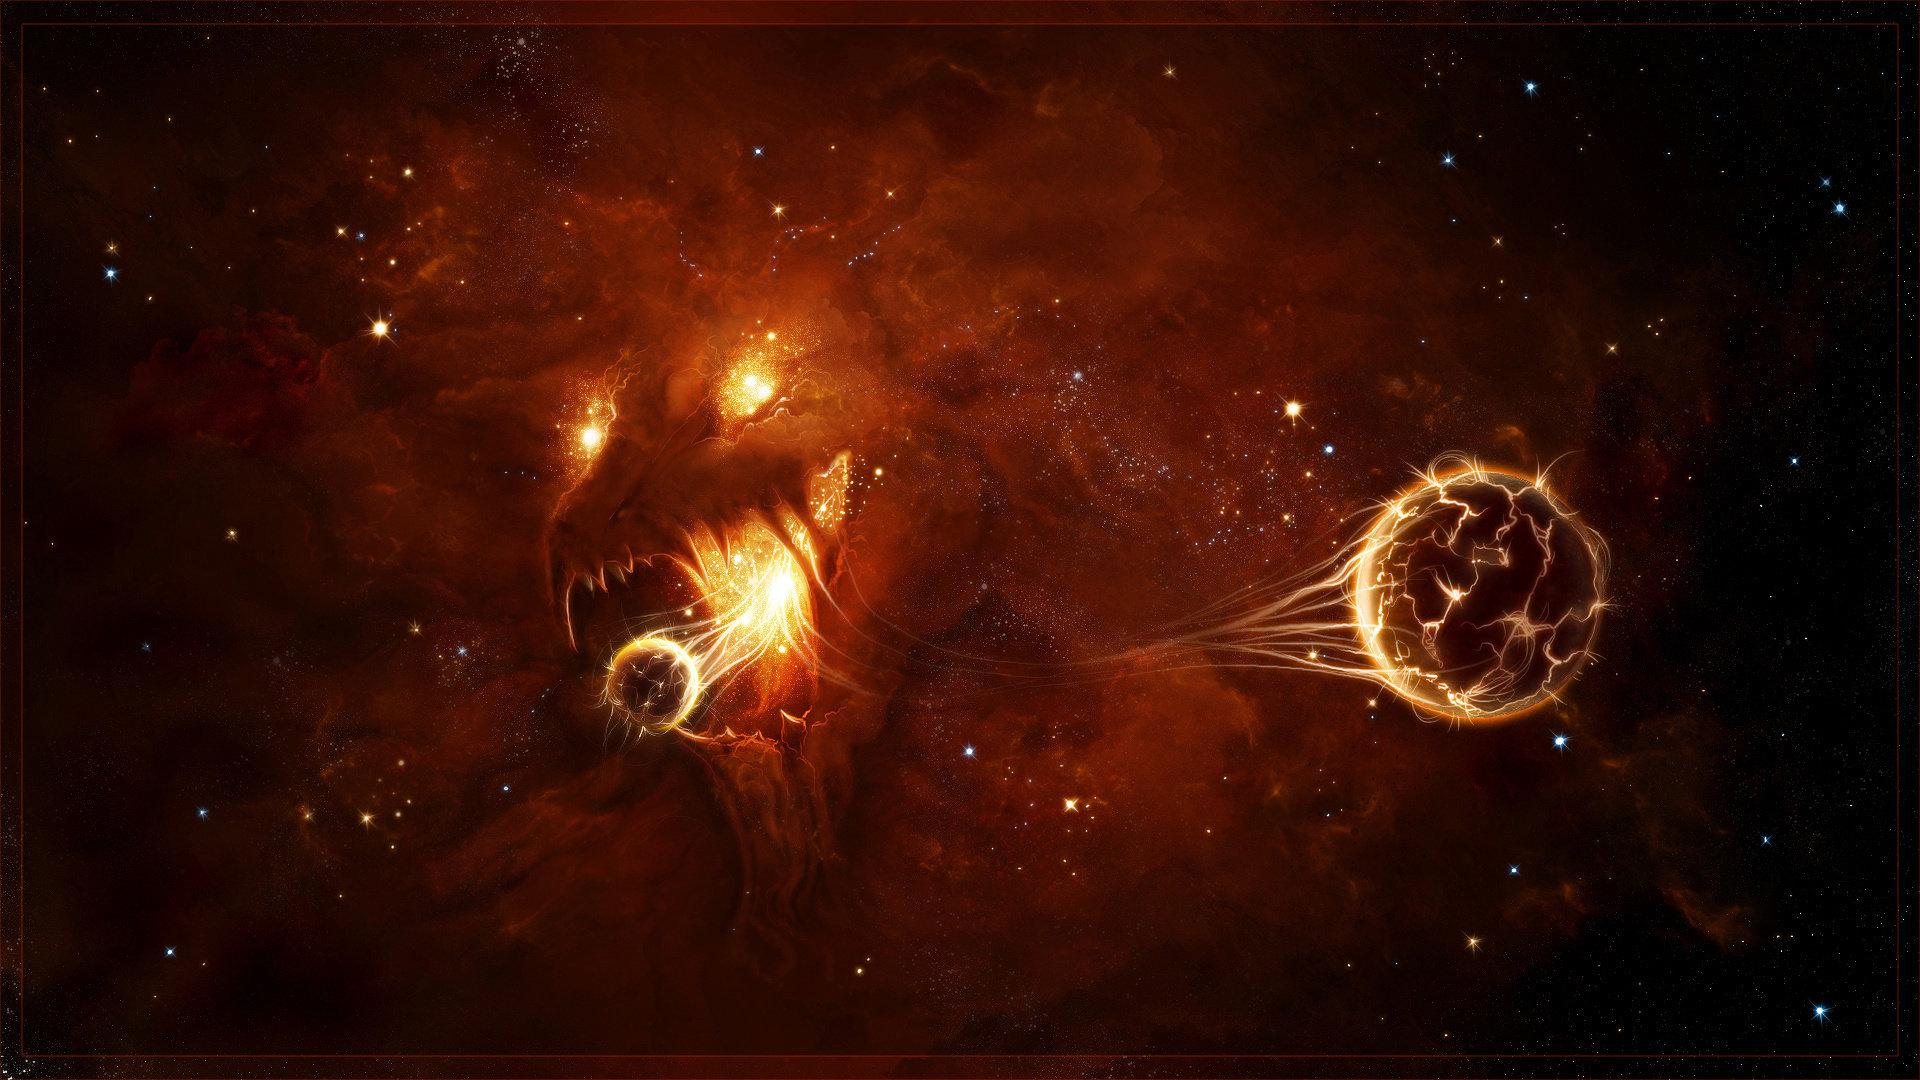 black hole wallpaper full hd 1080p 64643